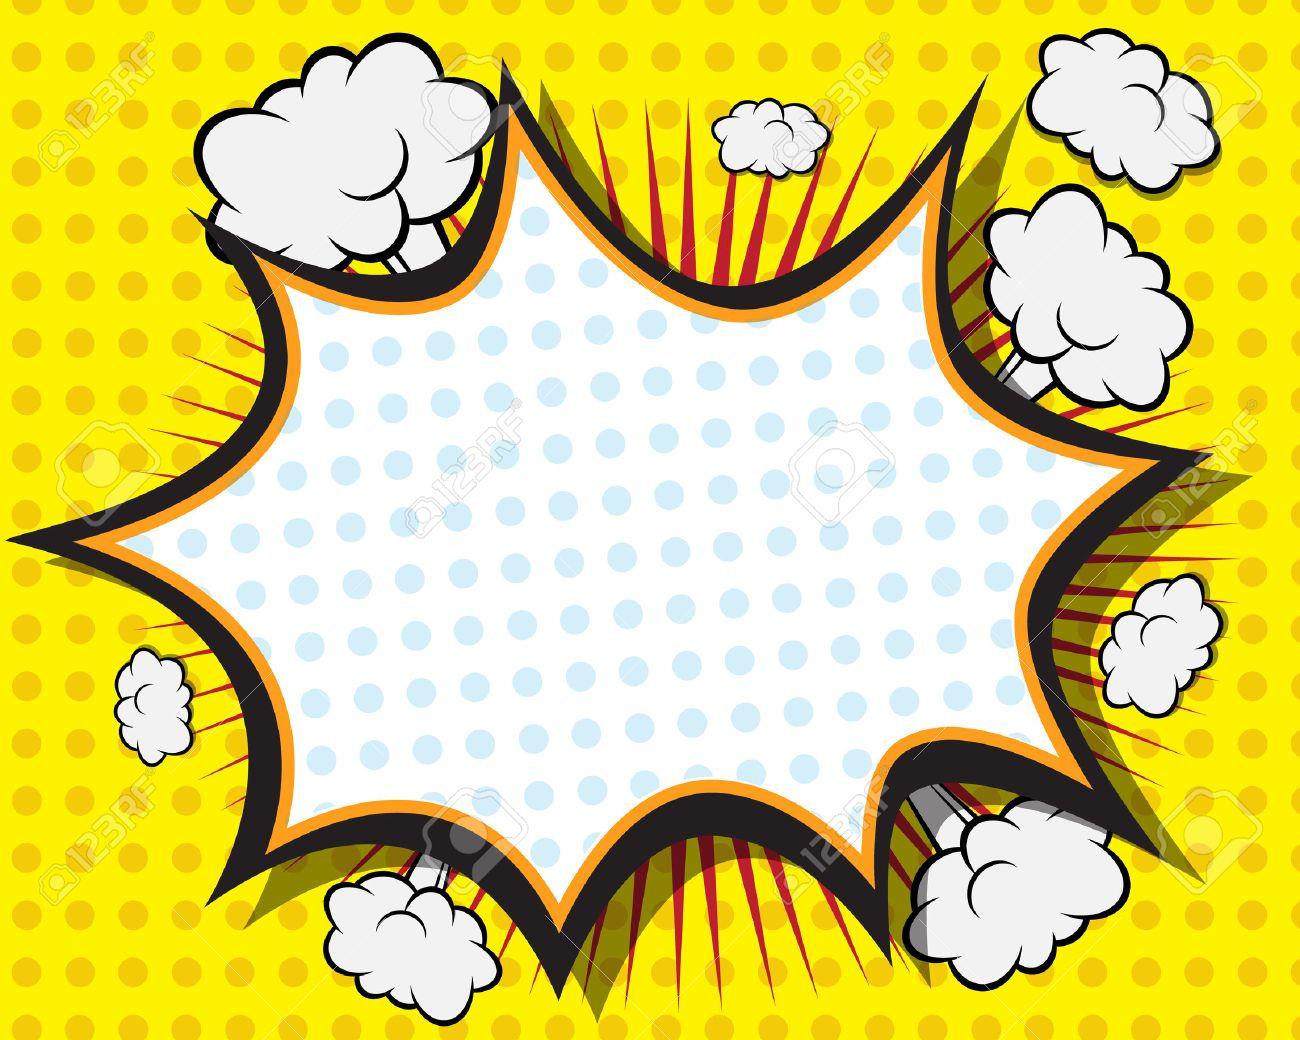 comic book speech bubble pop art background vector illustration rh 123rf com comic book vector background comic book vector border